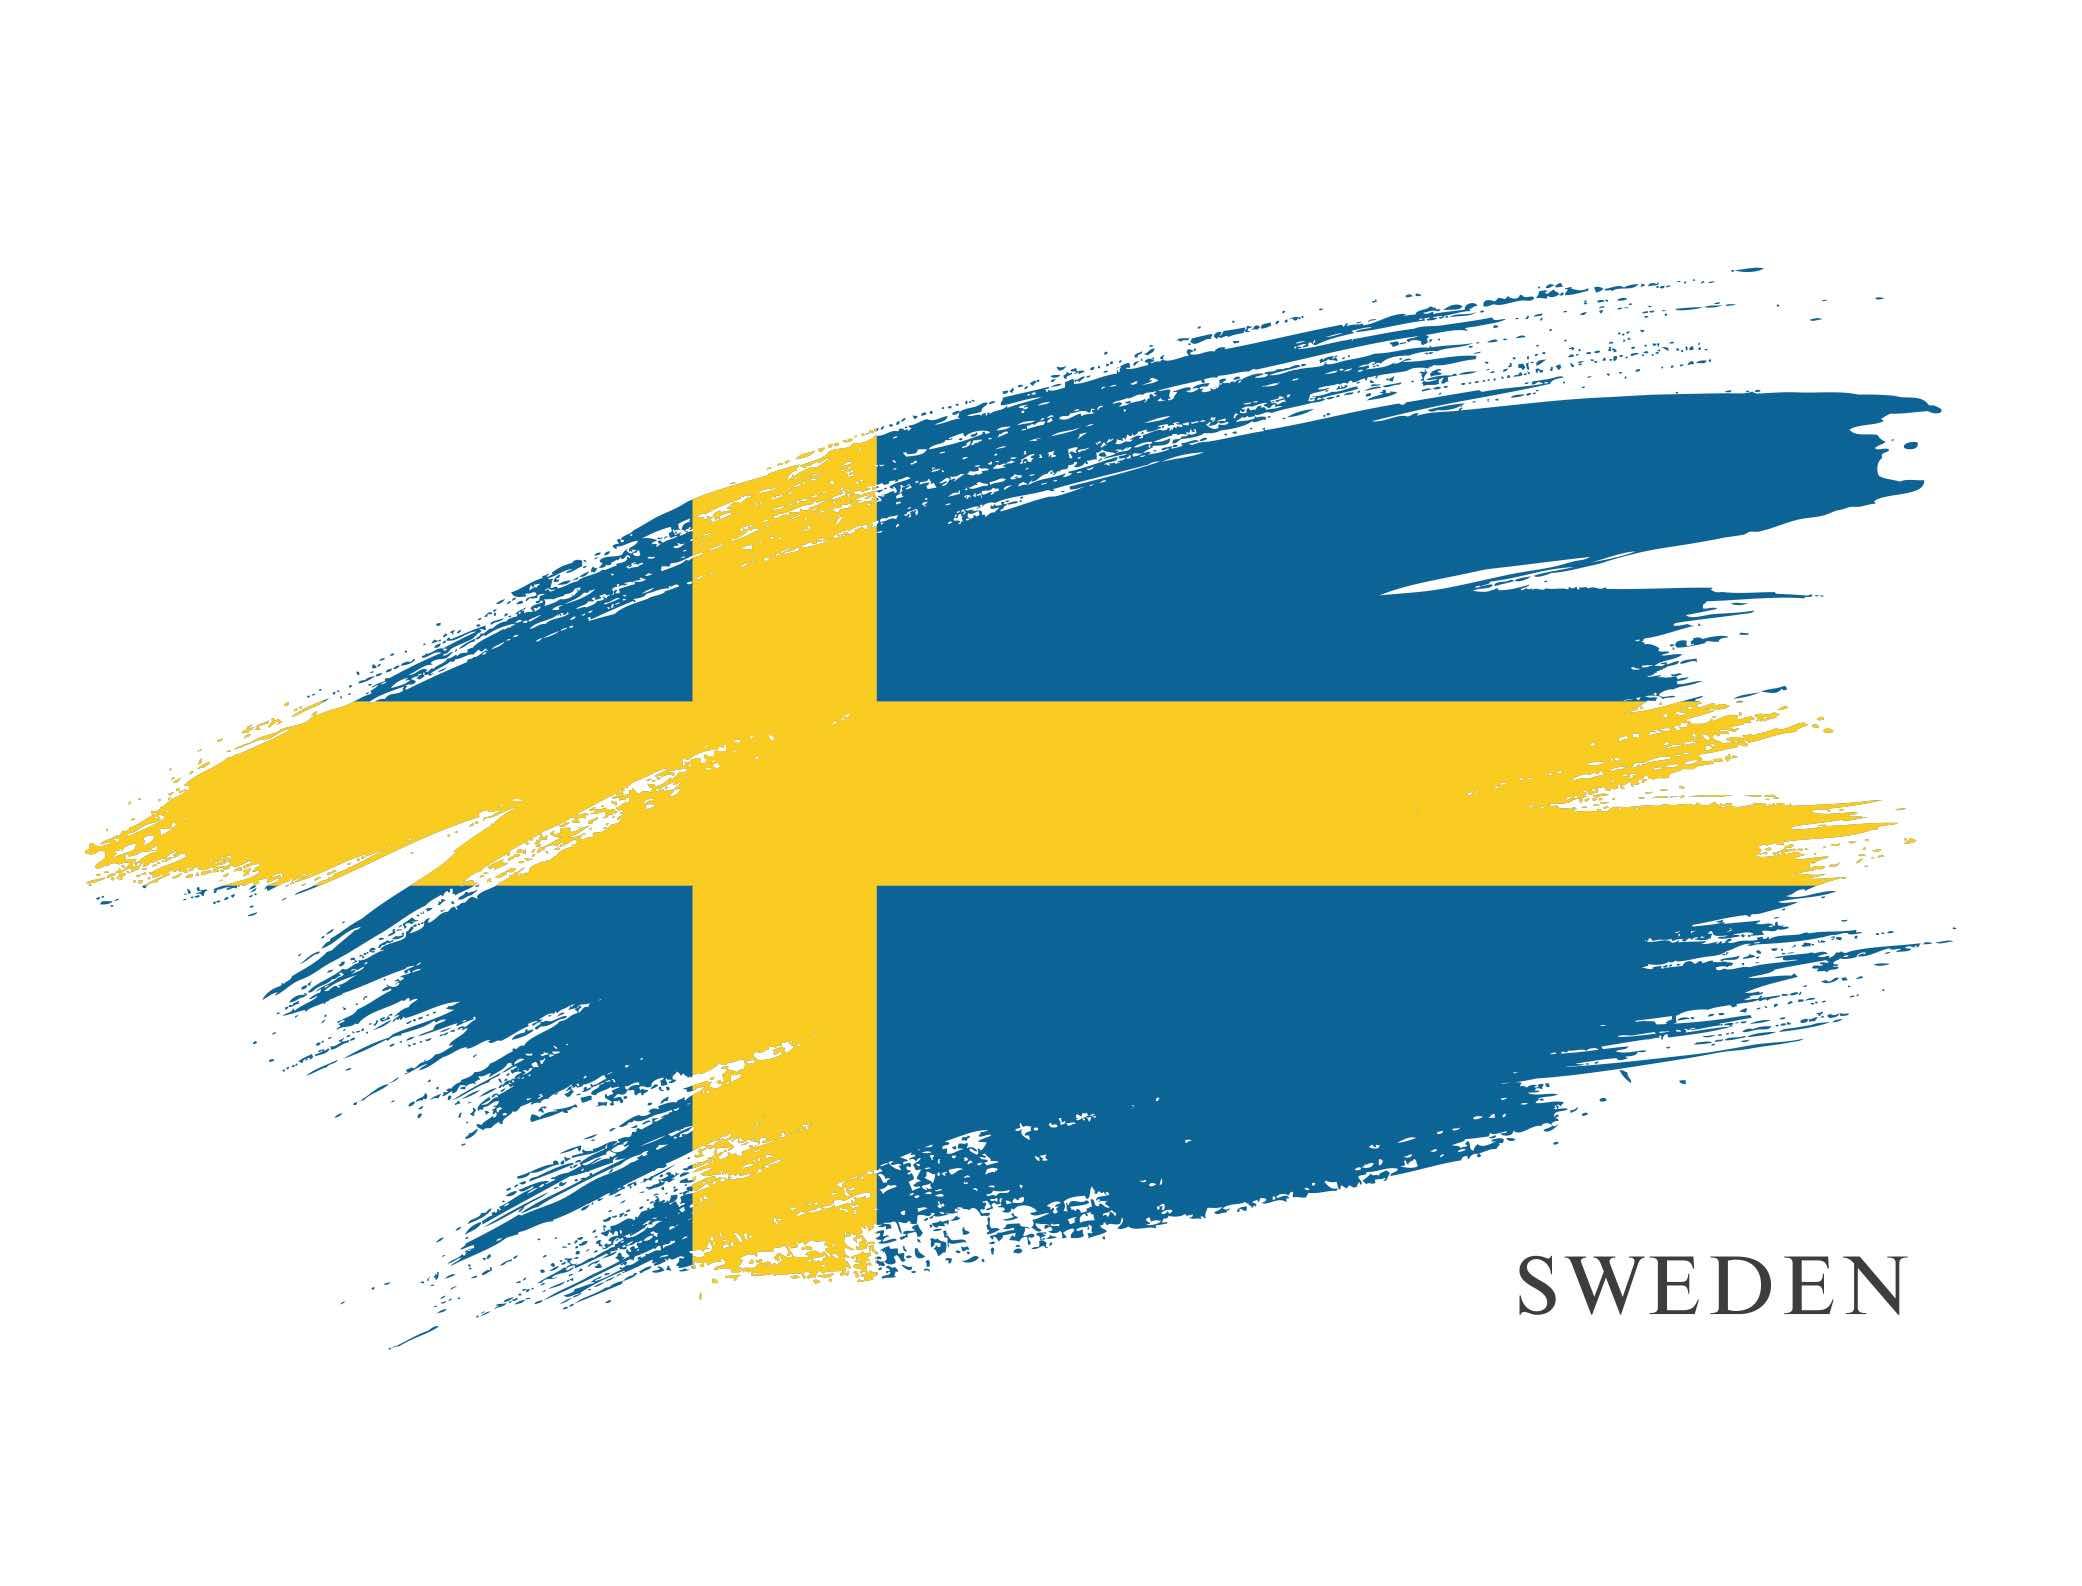 Artistic rendering of the flag of Sweden